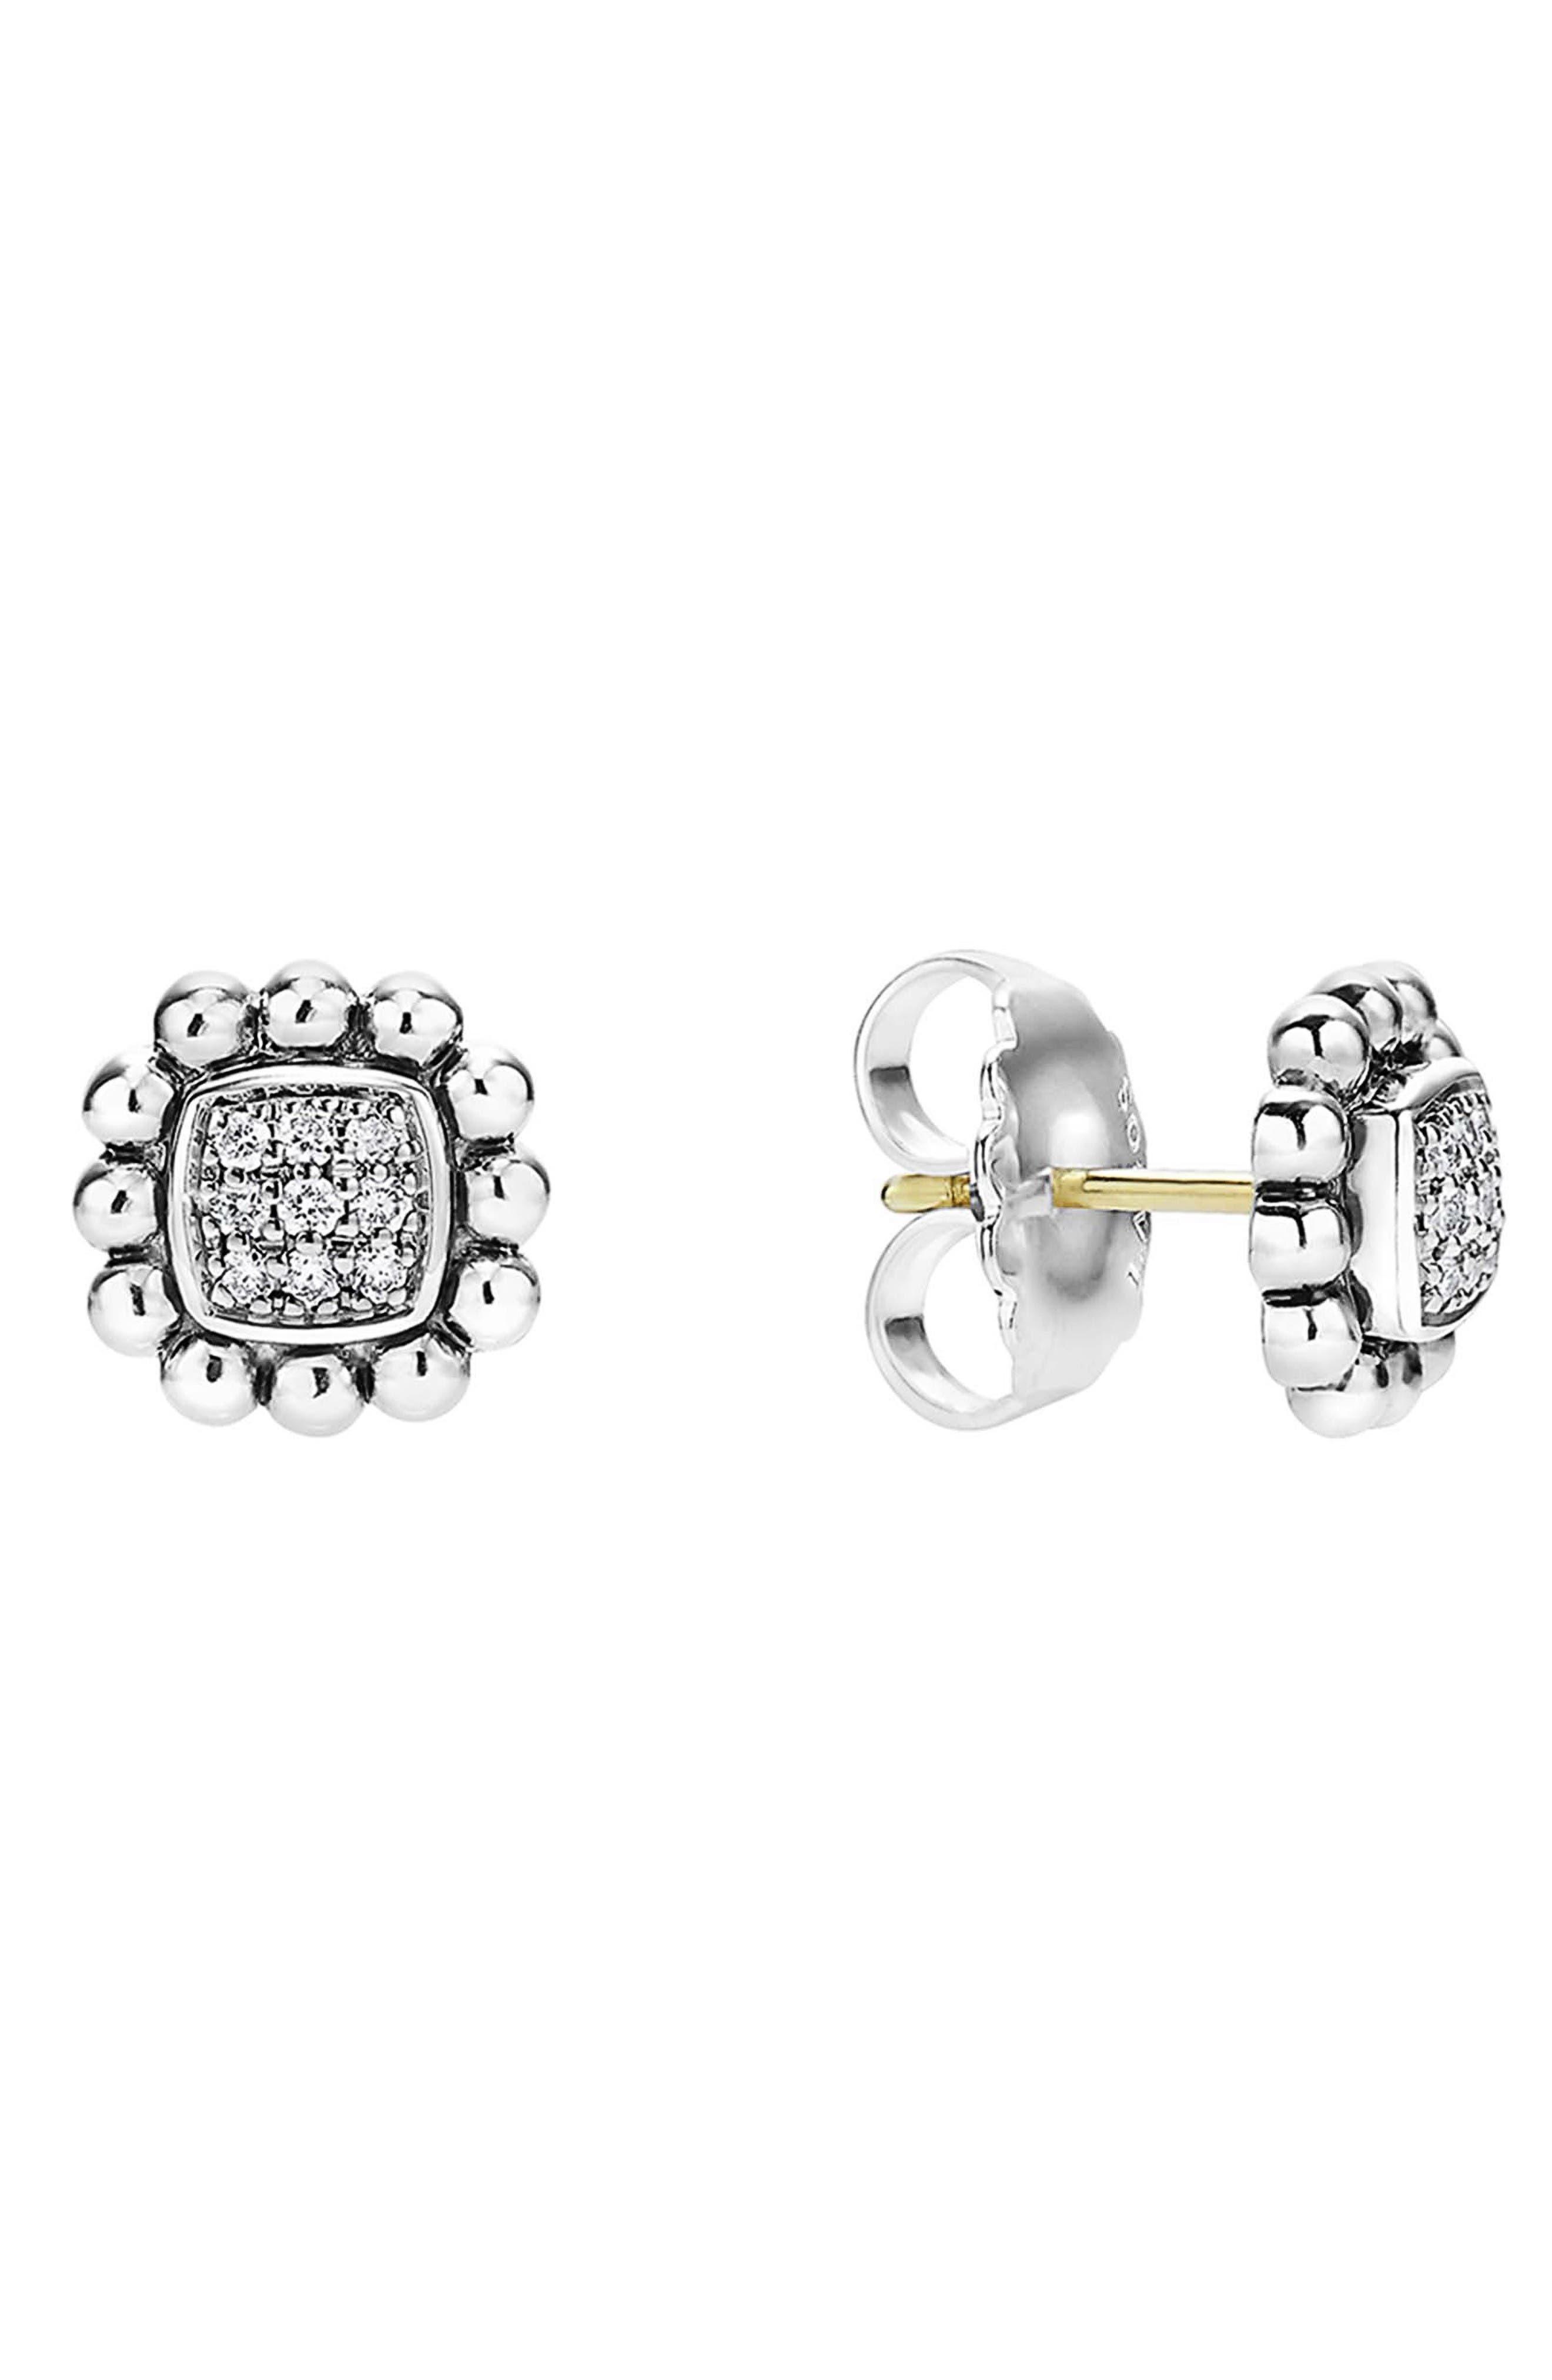 Caviar Spark Diamond Square Stud Earrings,                         Main,                         color, Silver/ Diamond